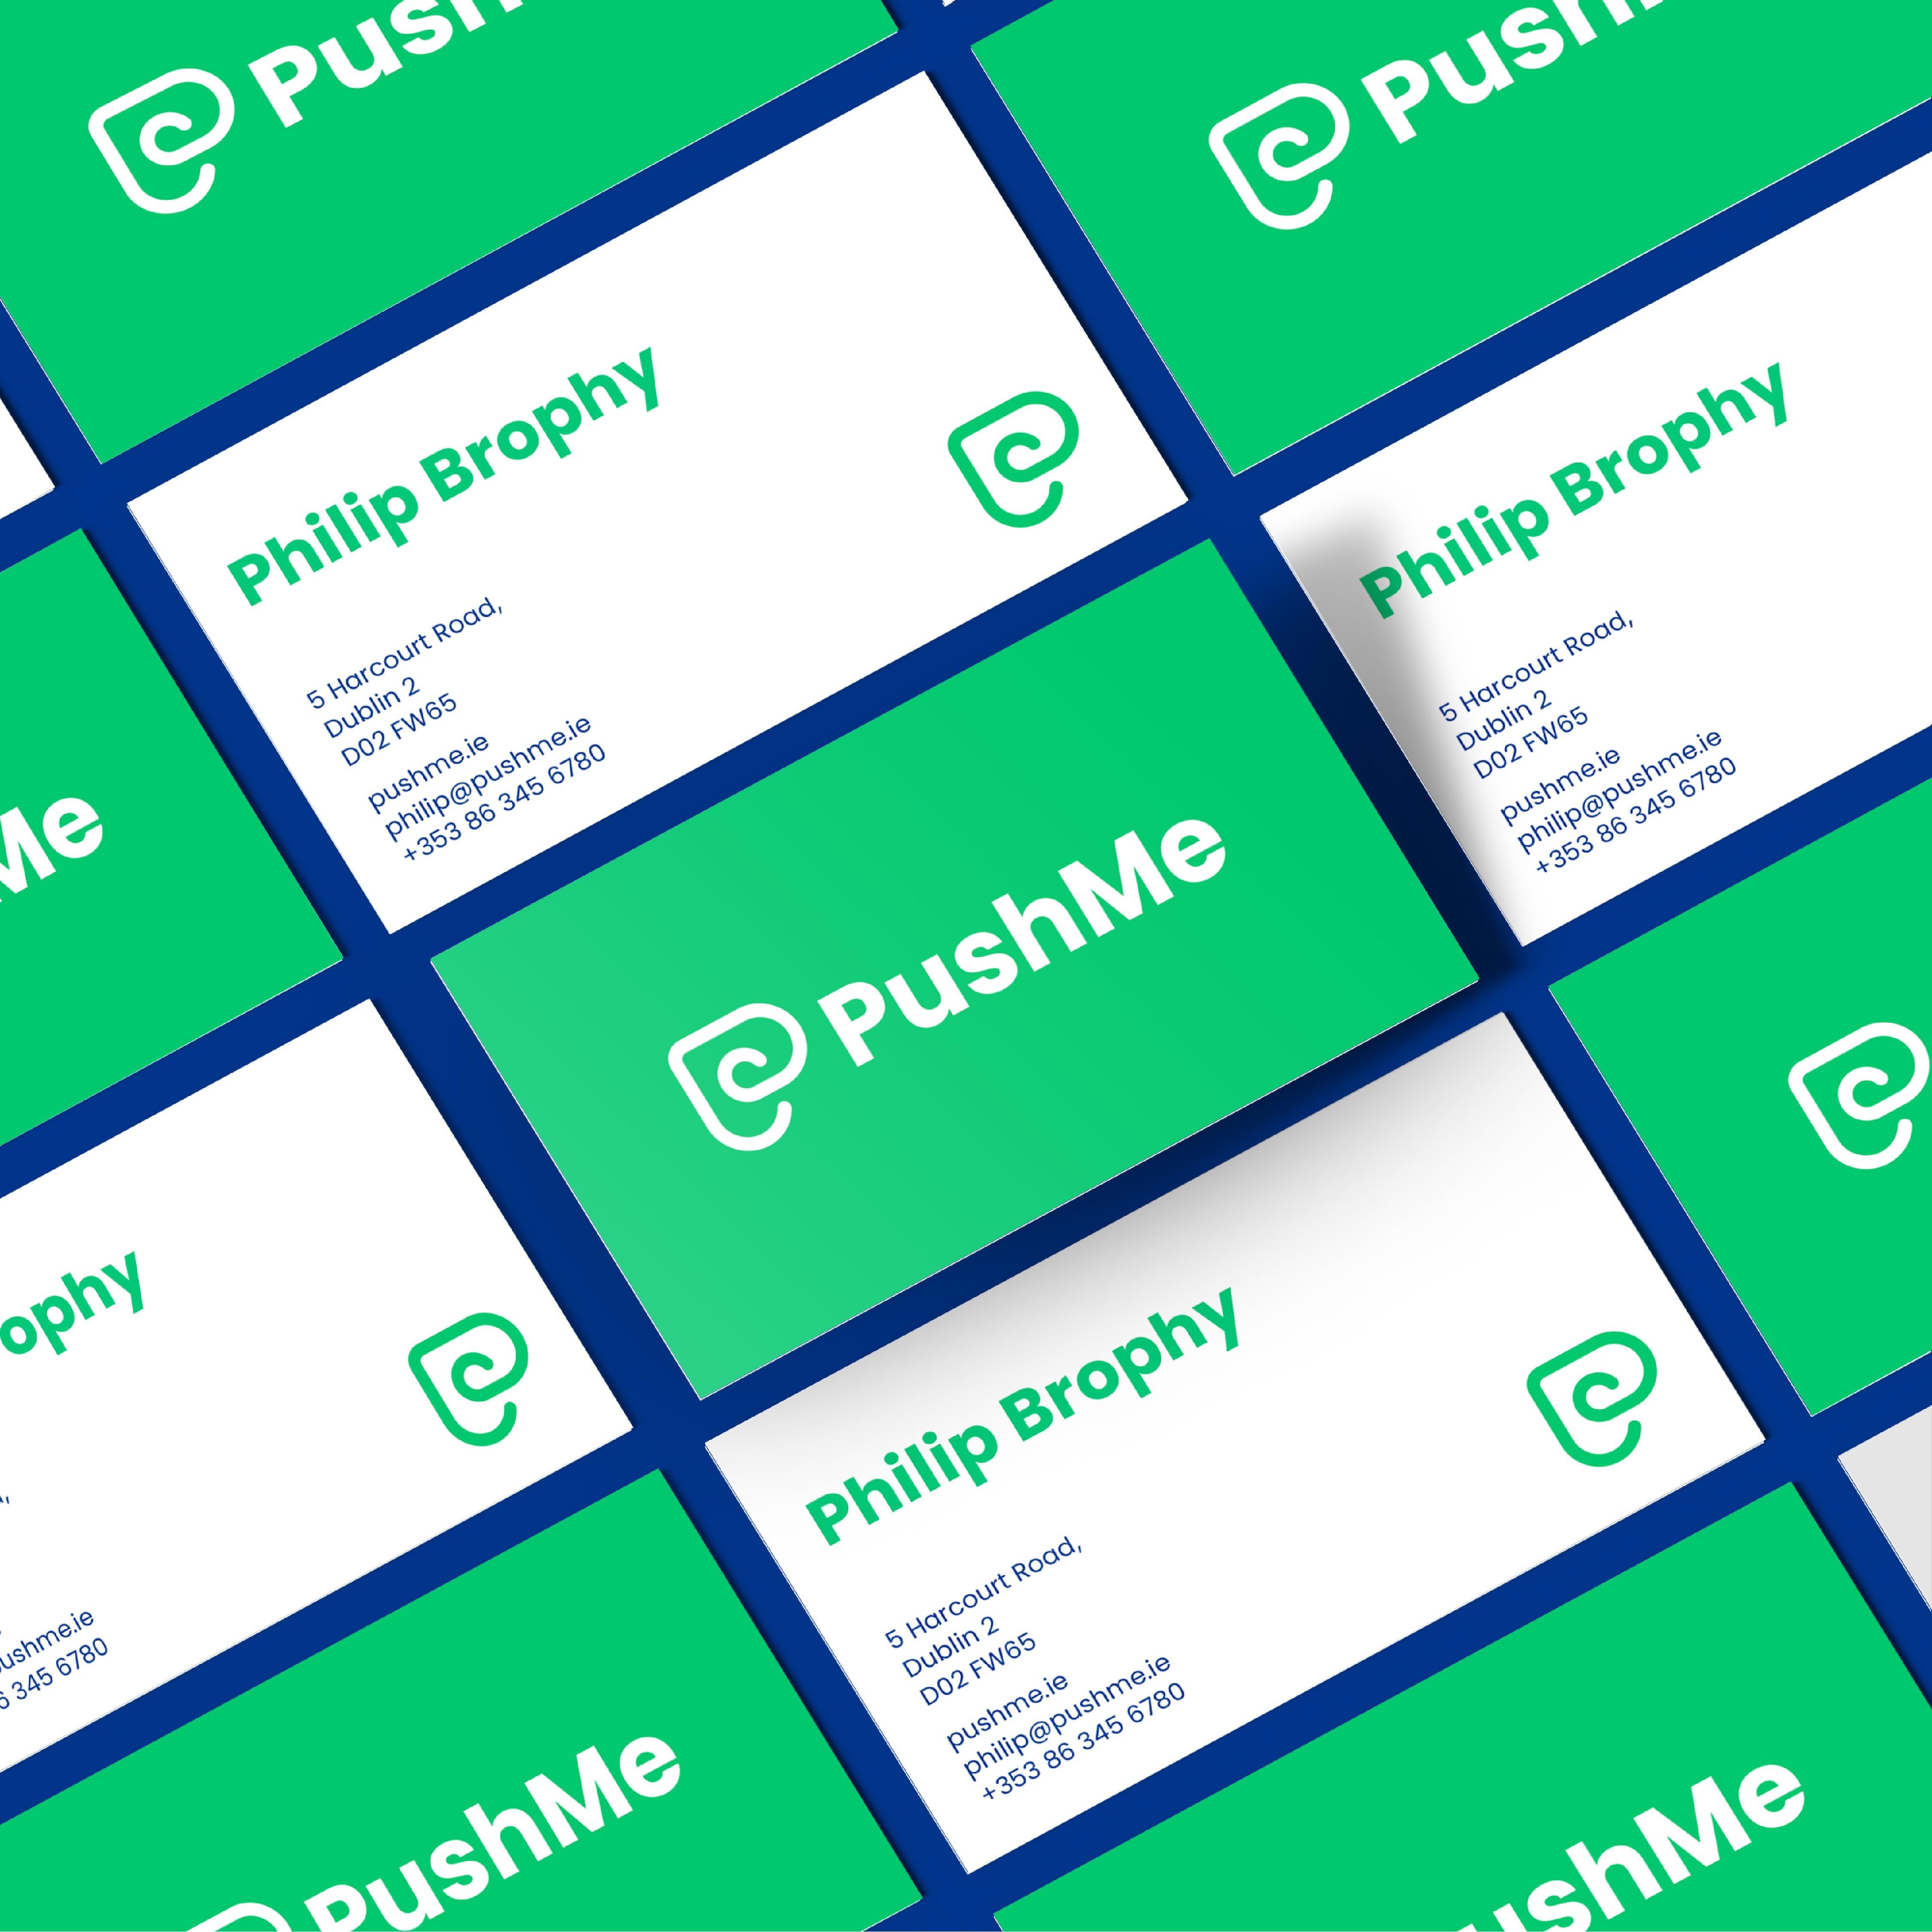 PushMe Brand Identity Designed by Michael Sloane